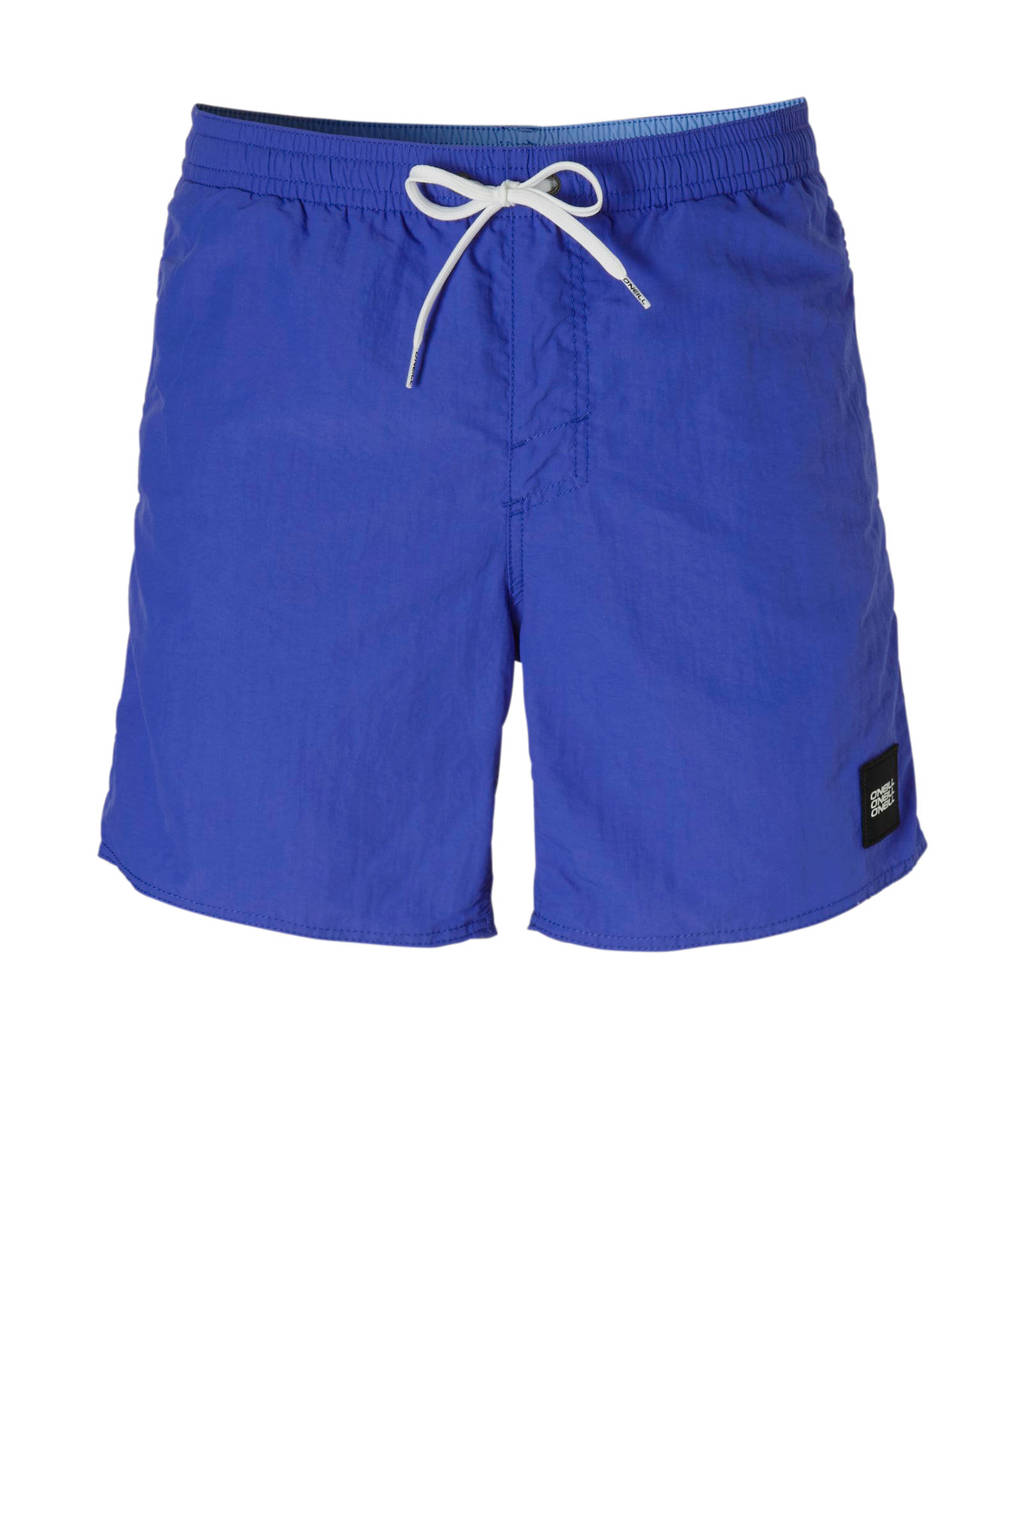 O'Neill zwemshort met zakken blauw, Blauw